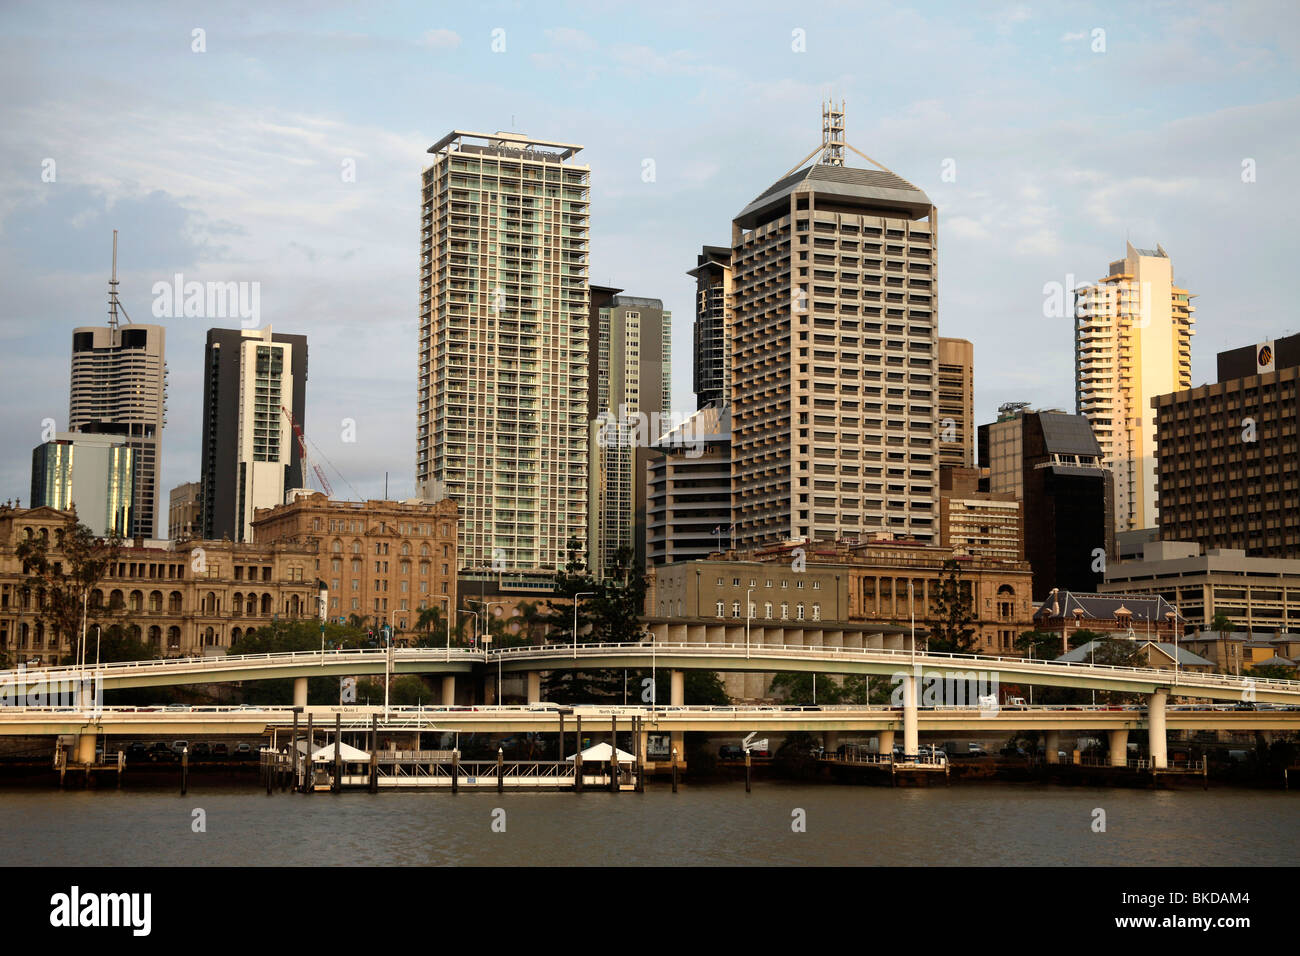 Skyscraper and River in Brisbane, Queensland, Australia - Stock Image